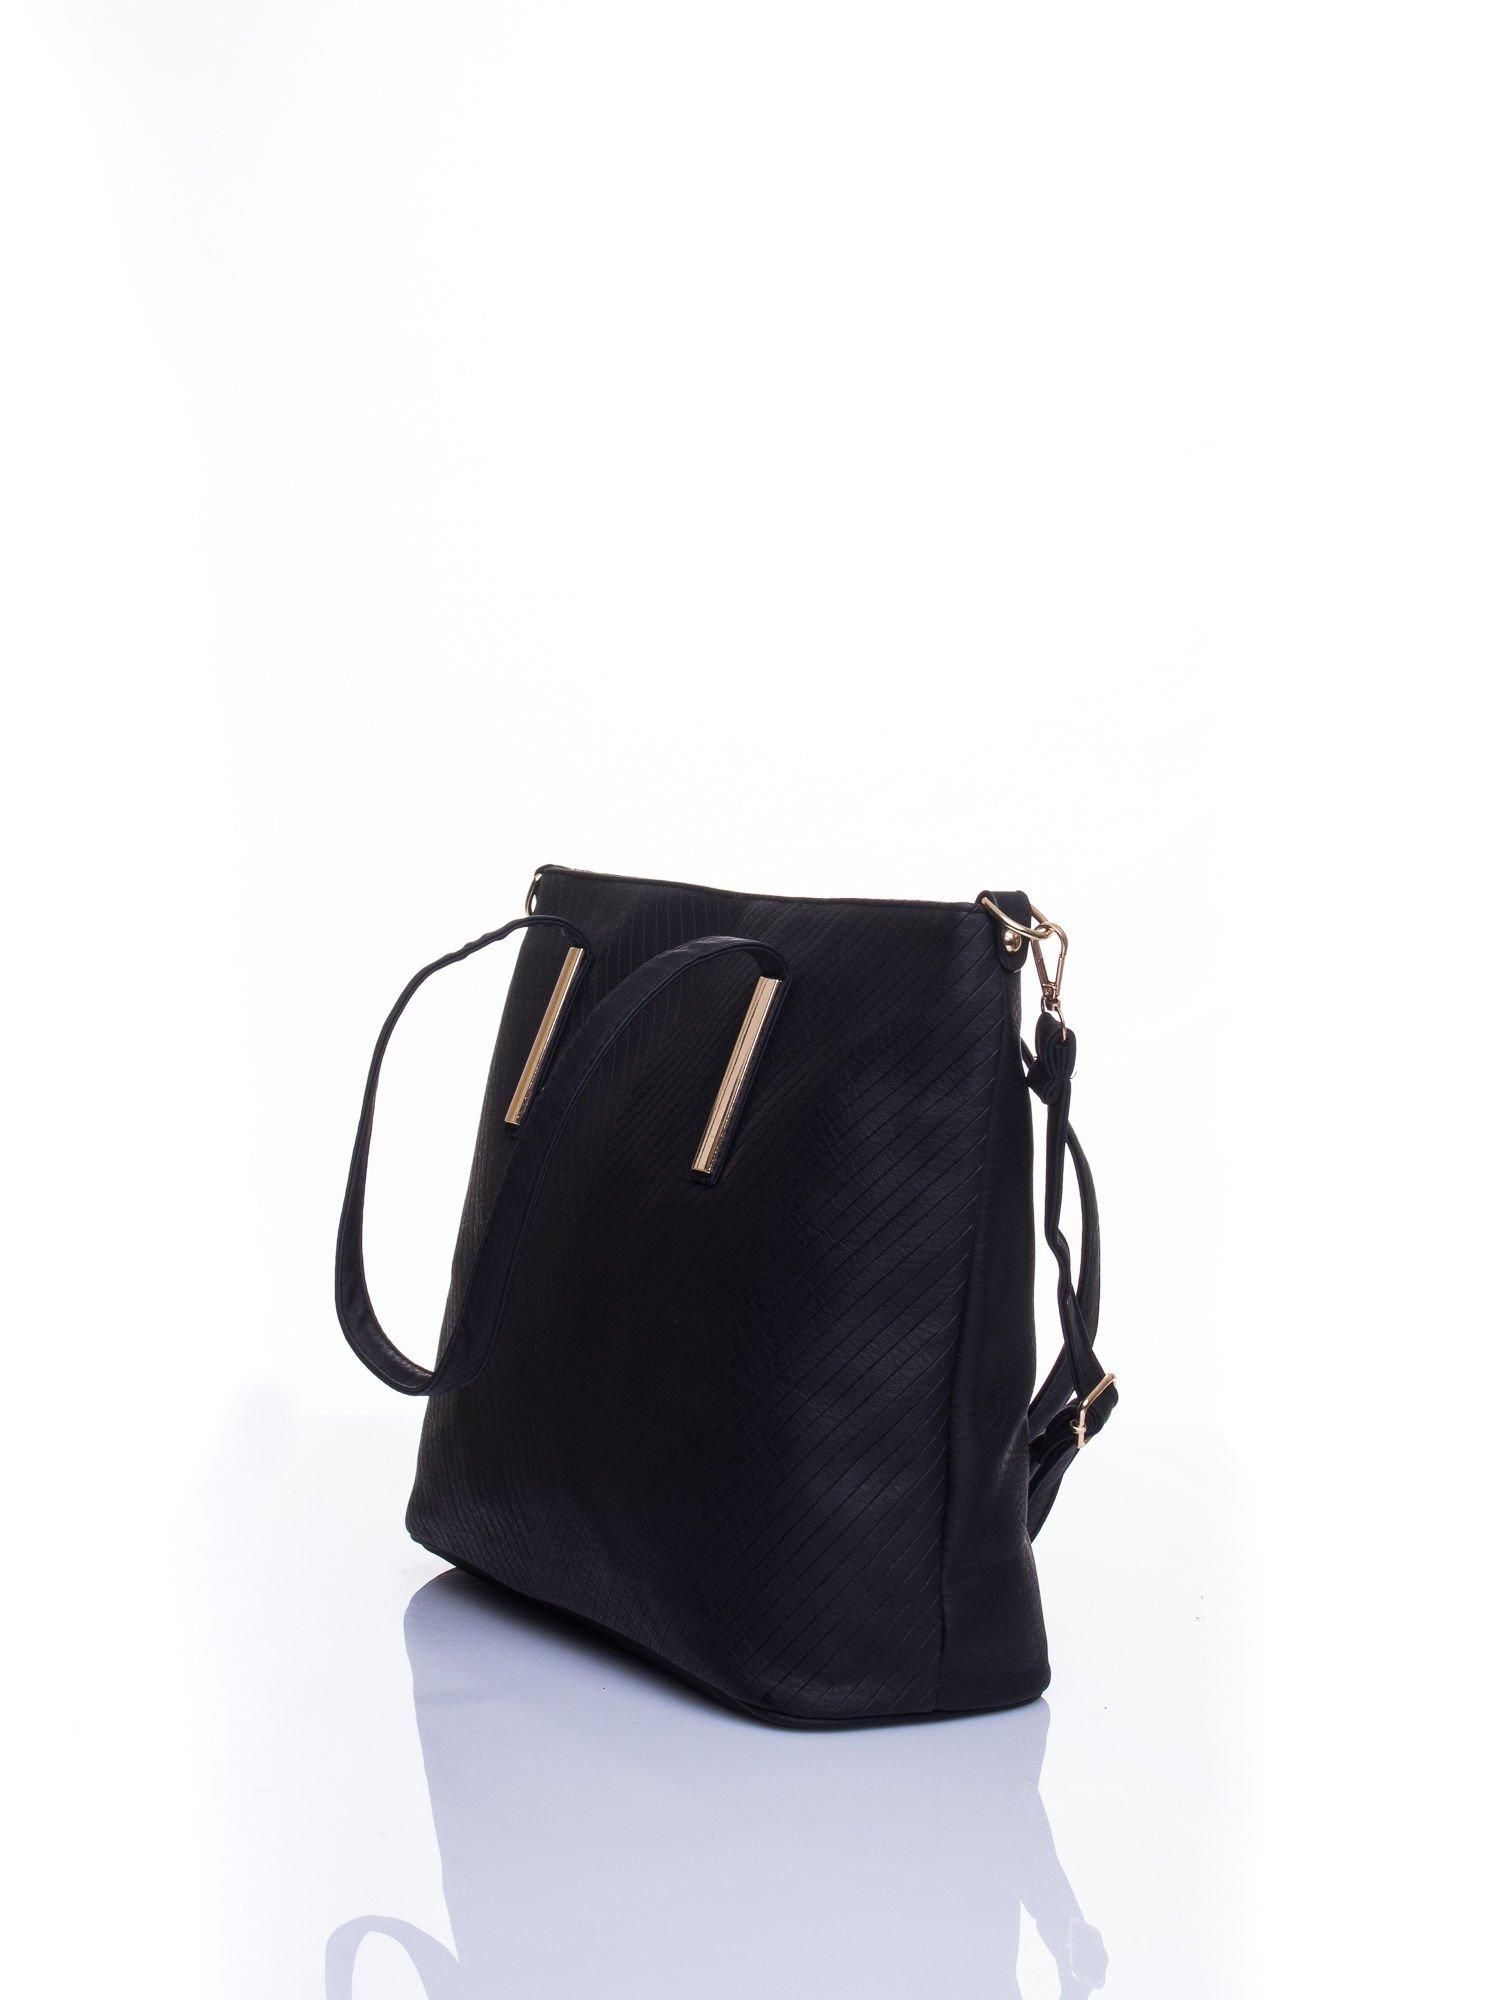 Czarna fakturowana torba shopper bag                                  zdj.                                  4